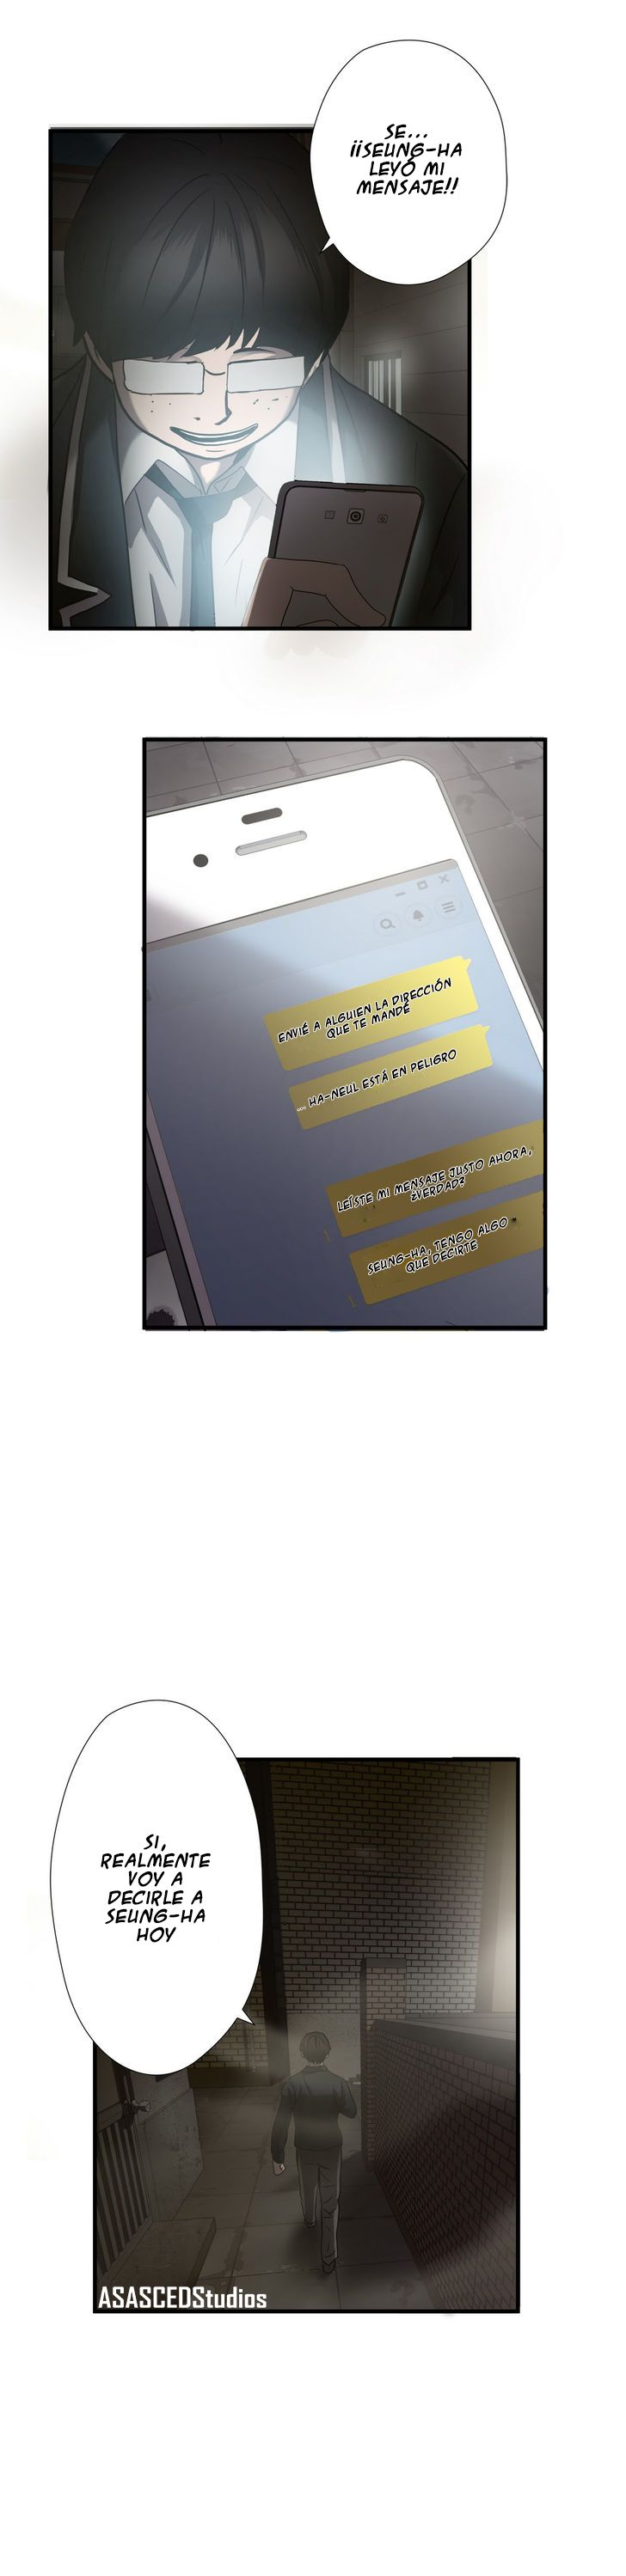 https://c5.ninemanga.com/es_manga/pic2/58/19386/503865/c16c4407a60fbdfc8930637b47cd2a1a.jpg Page 2